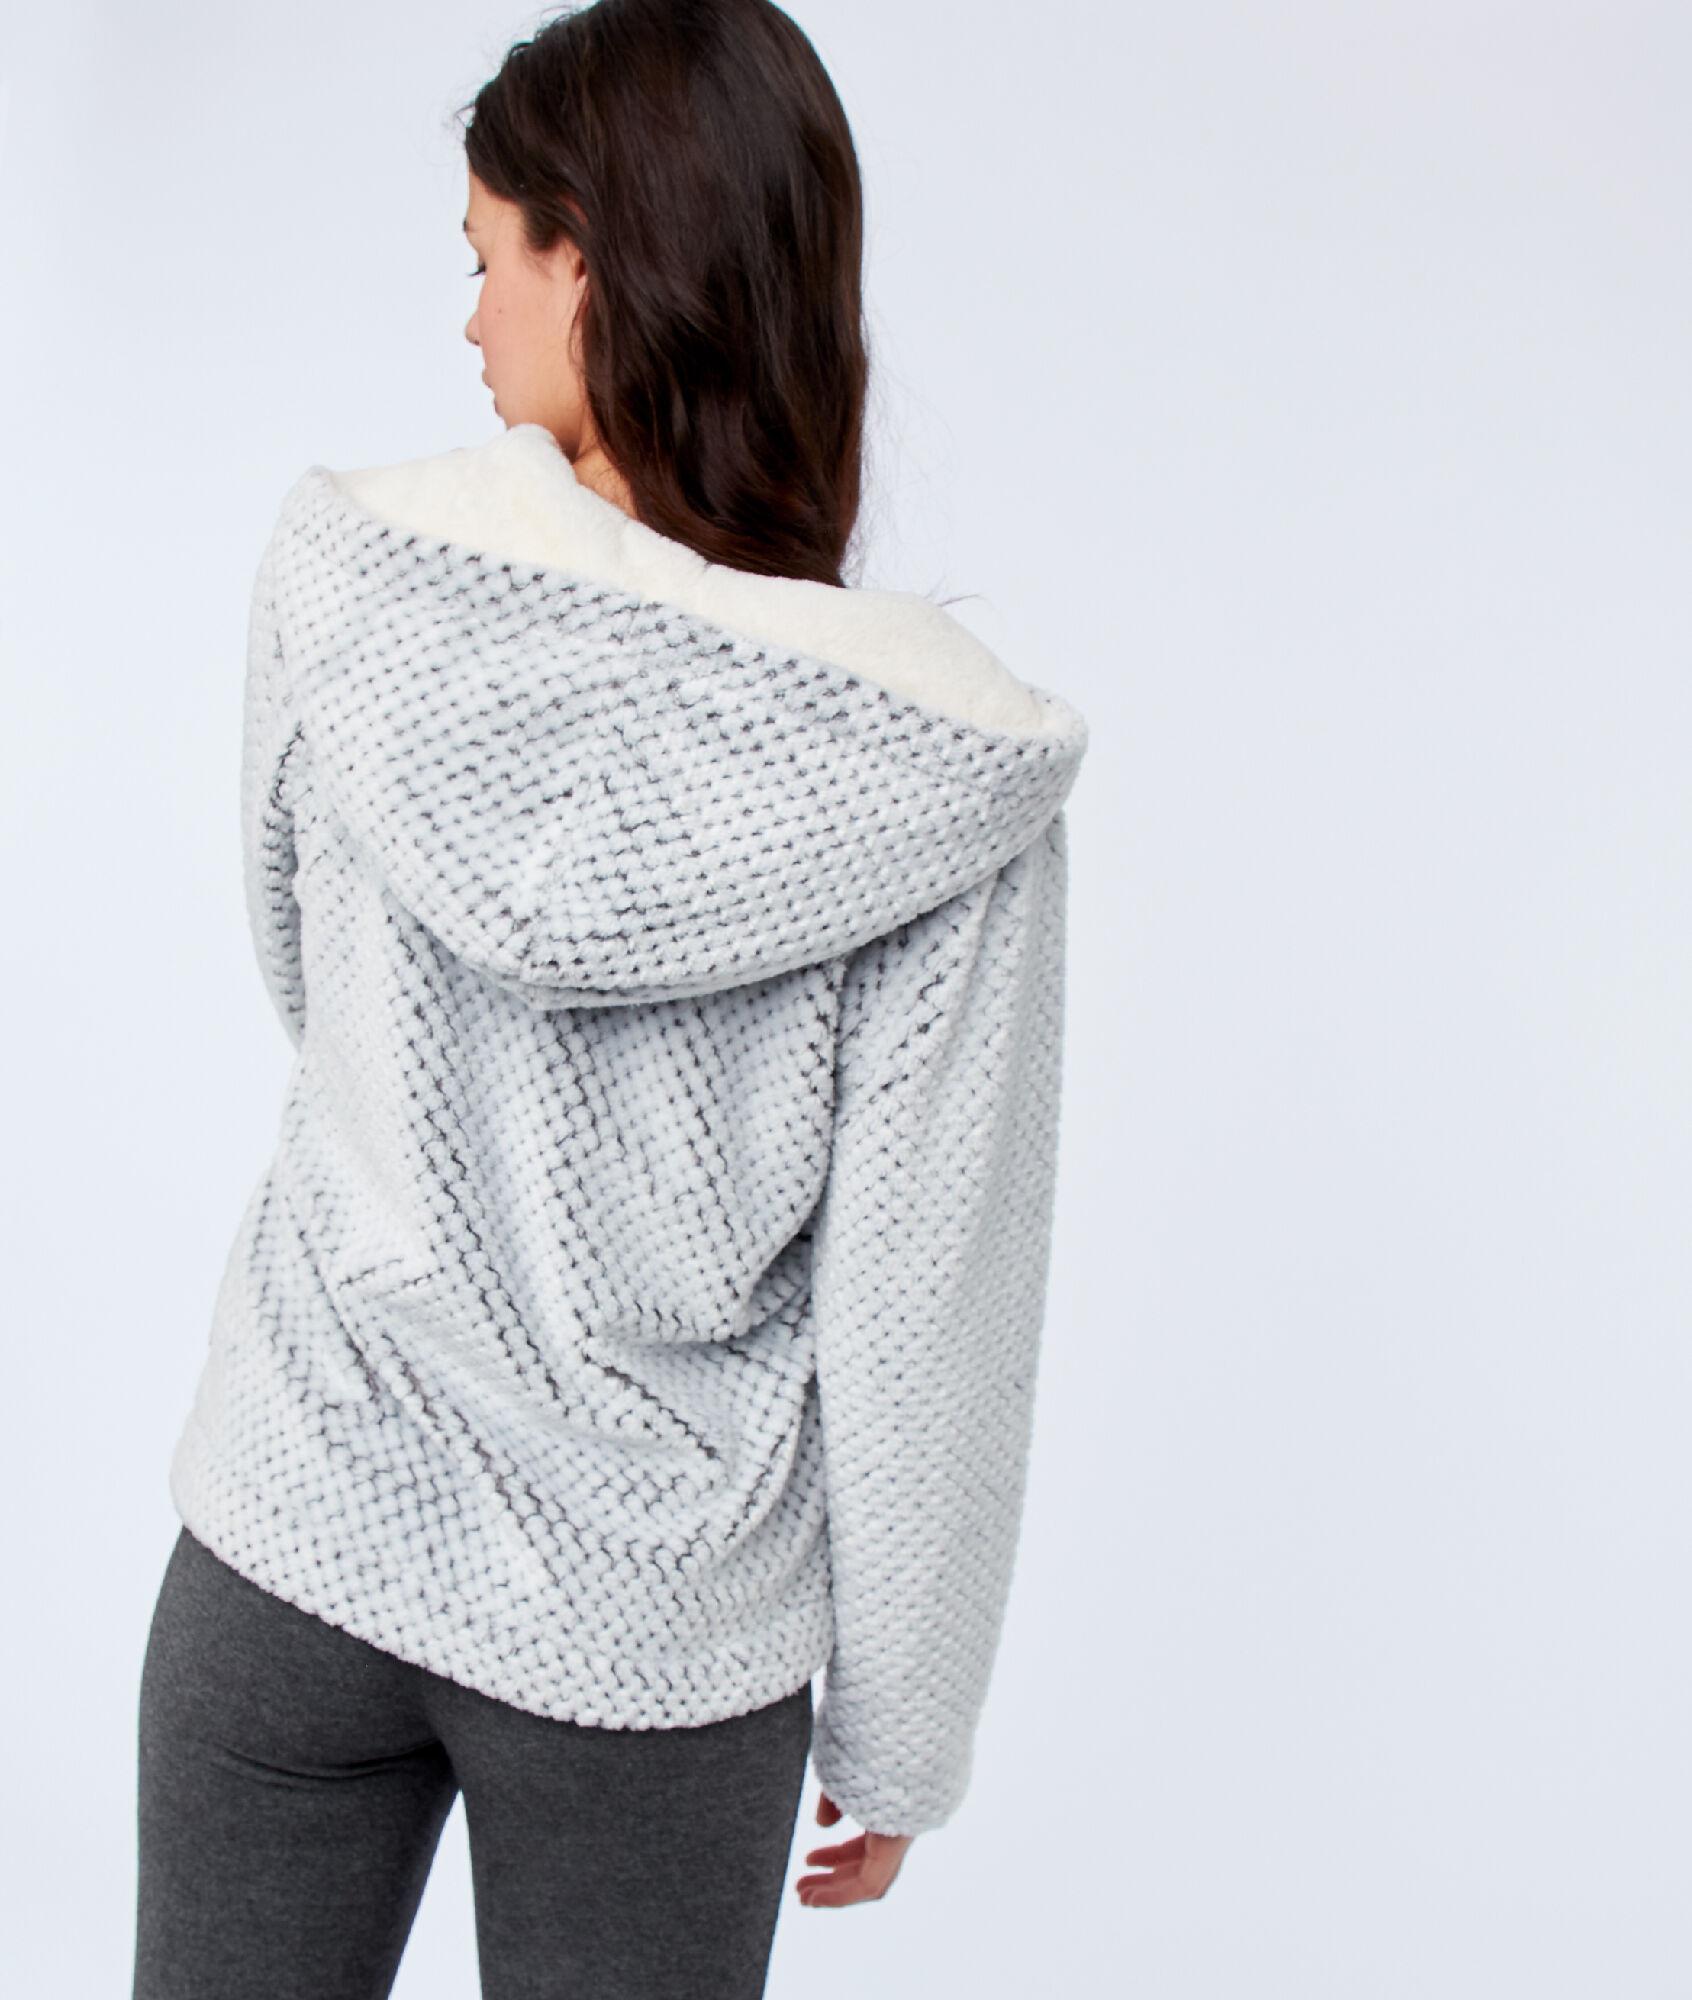 Chaqueta con capucha tejido peluche - SOFTY - C.GRIS - Etam